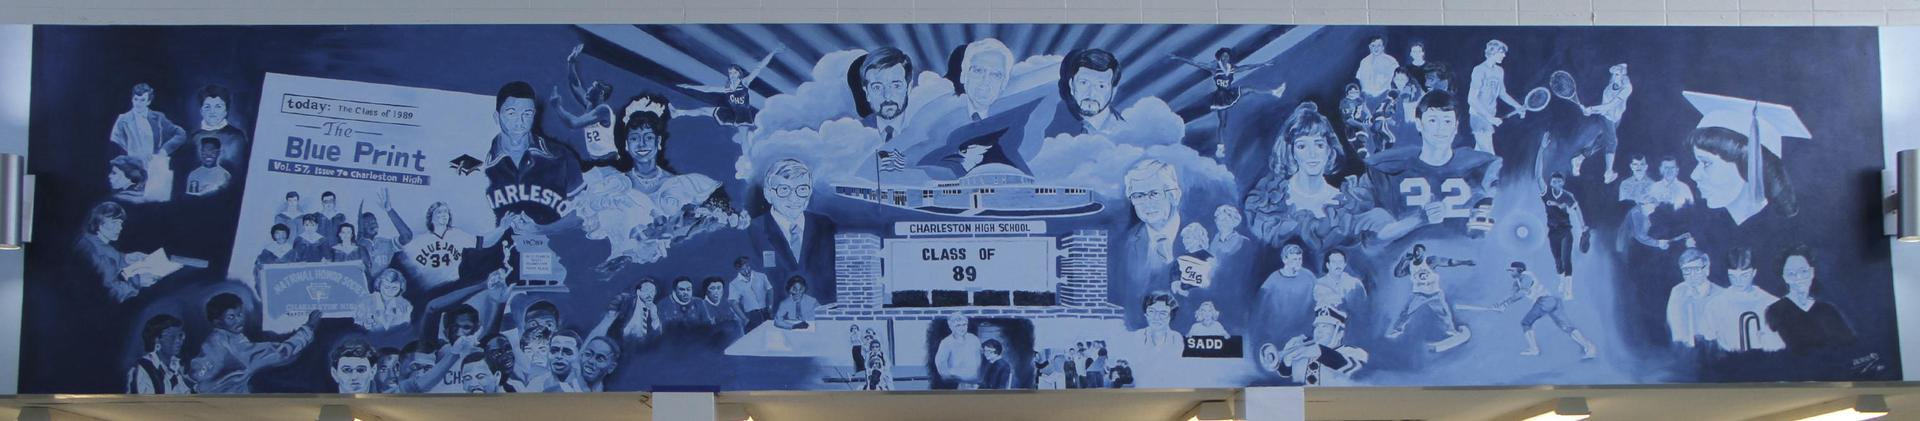 CHS Commons Mural